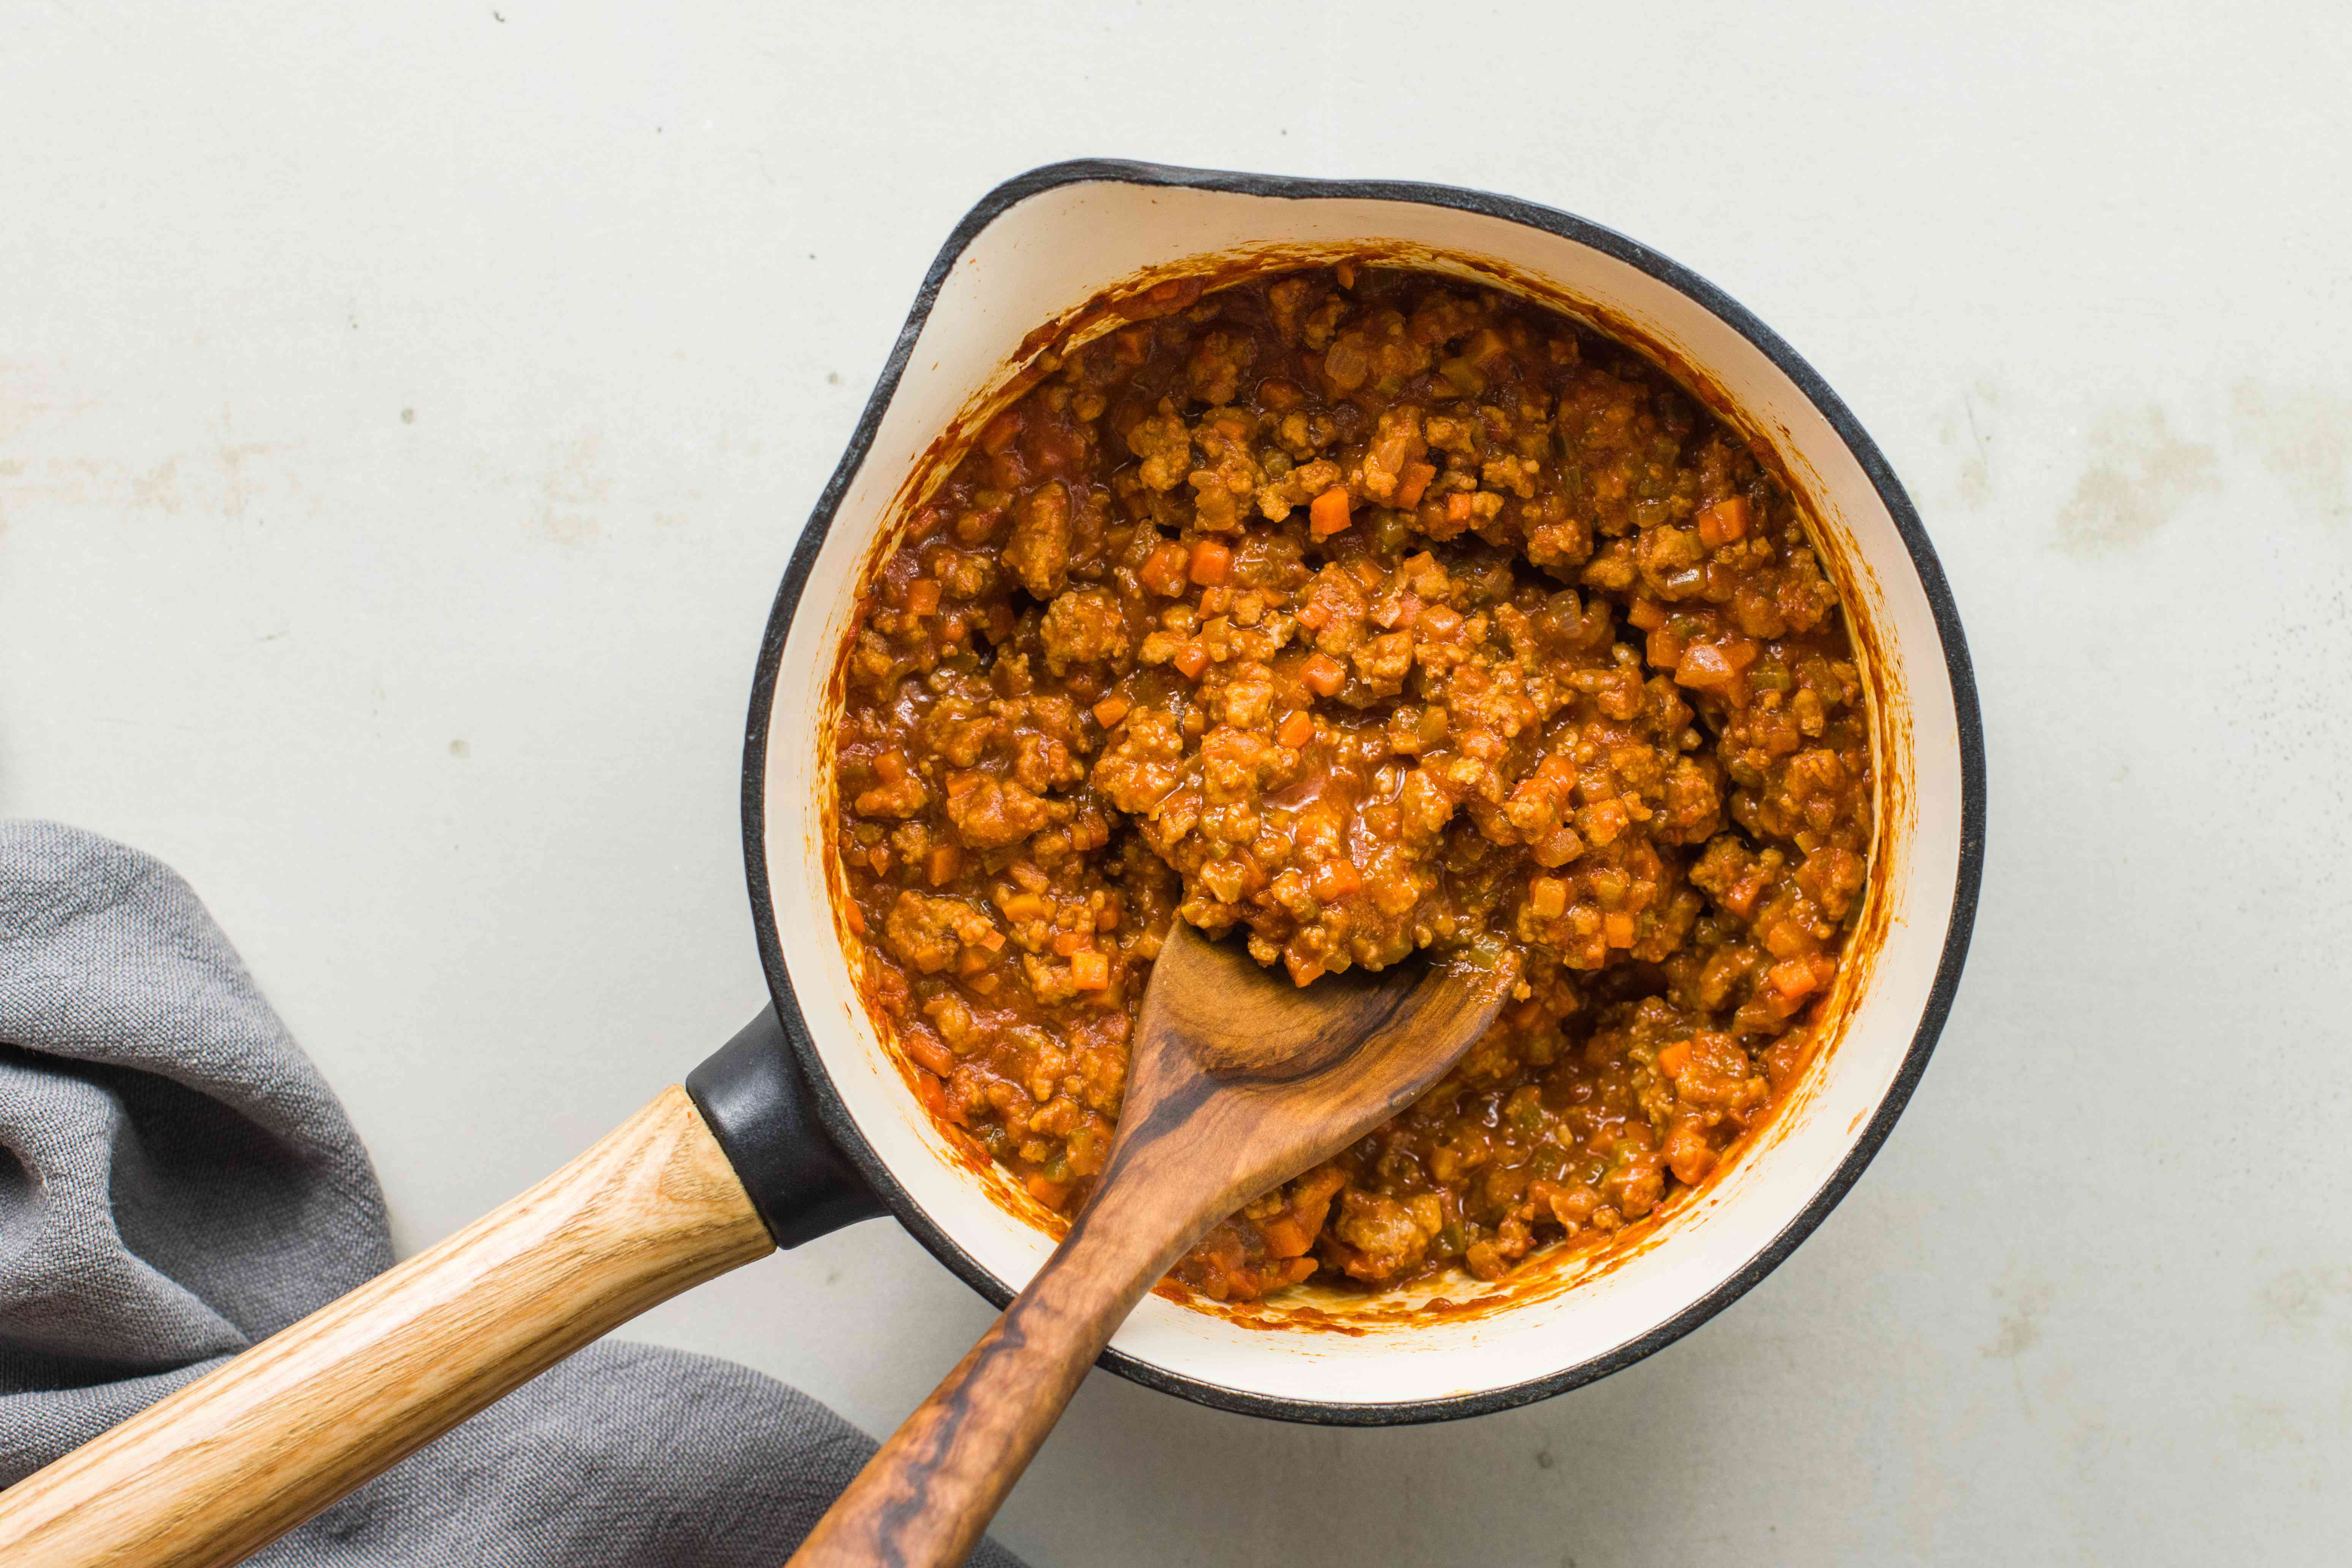 Stir in meat sauce